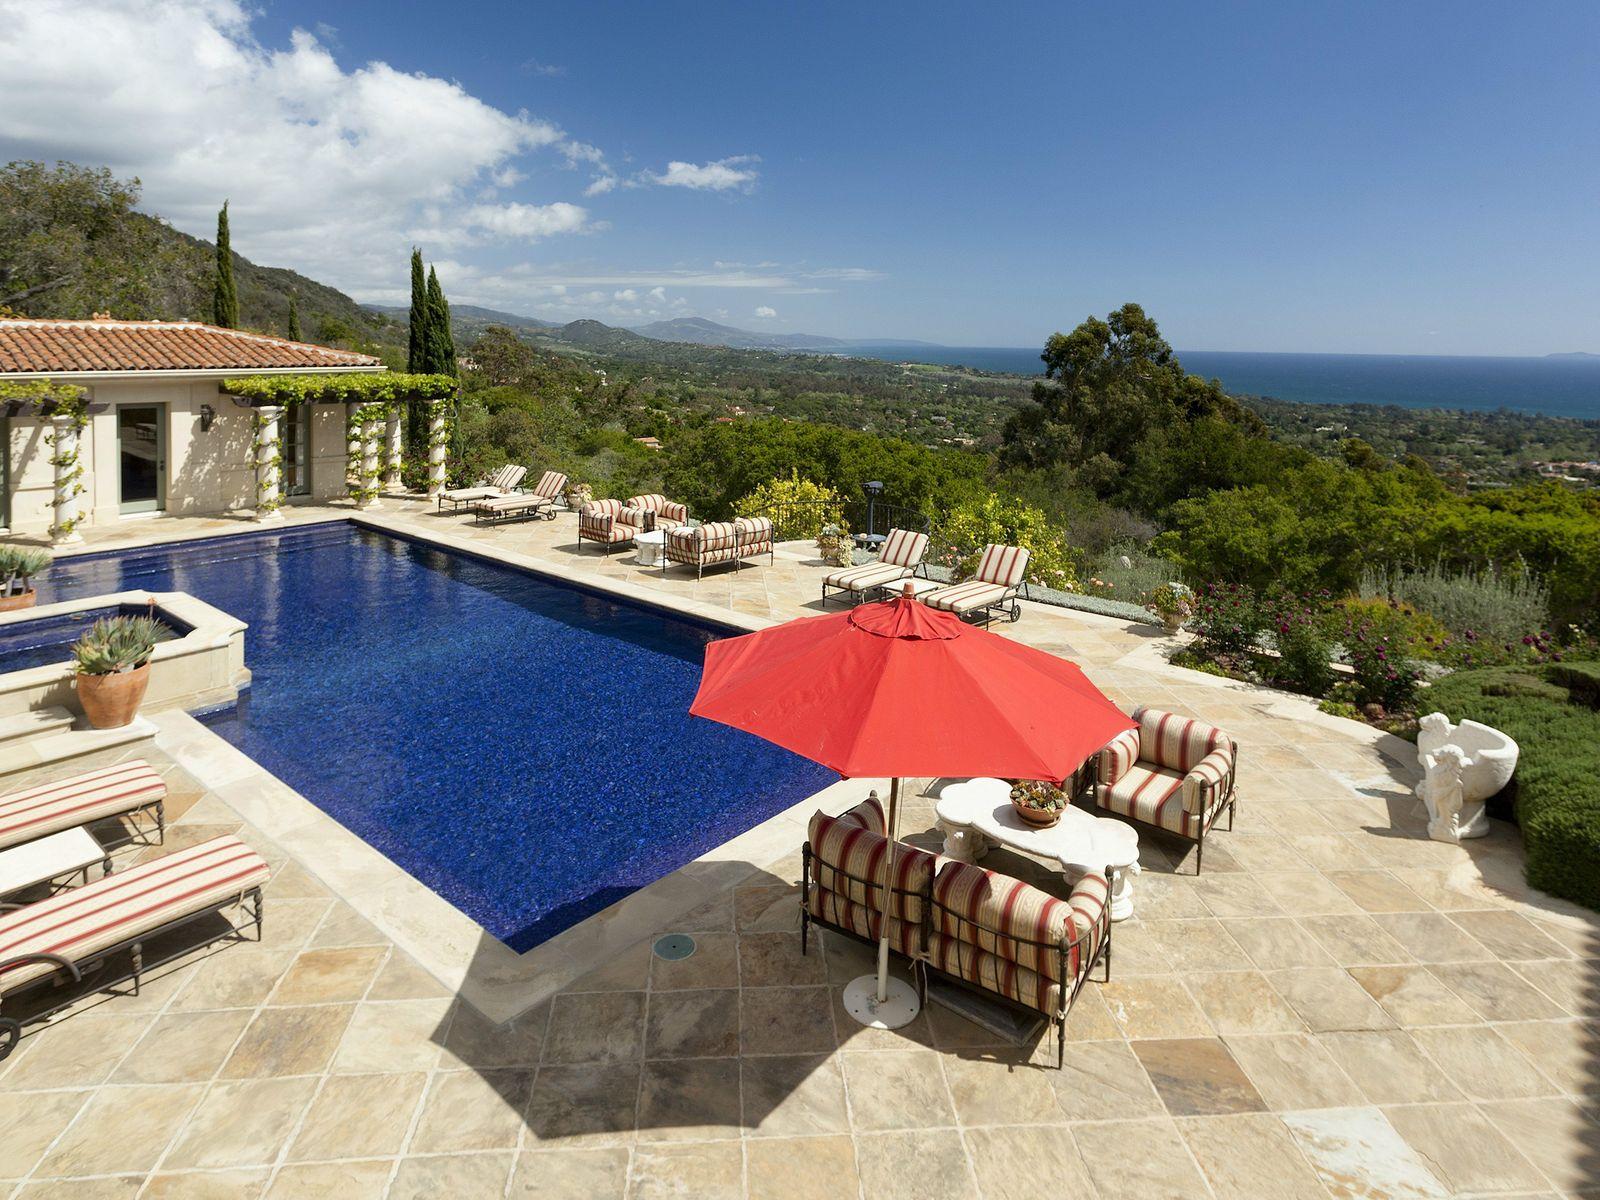 Pool House, pool, and panoramic ocean views